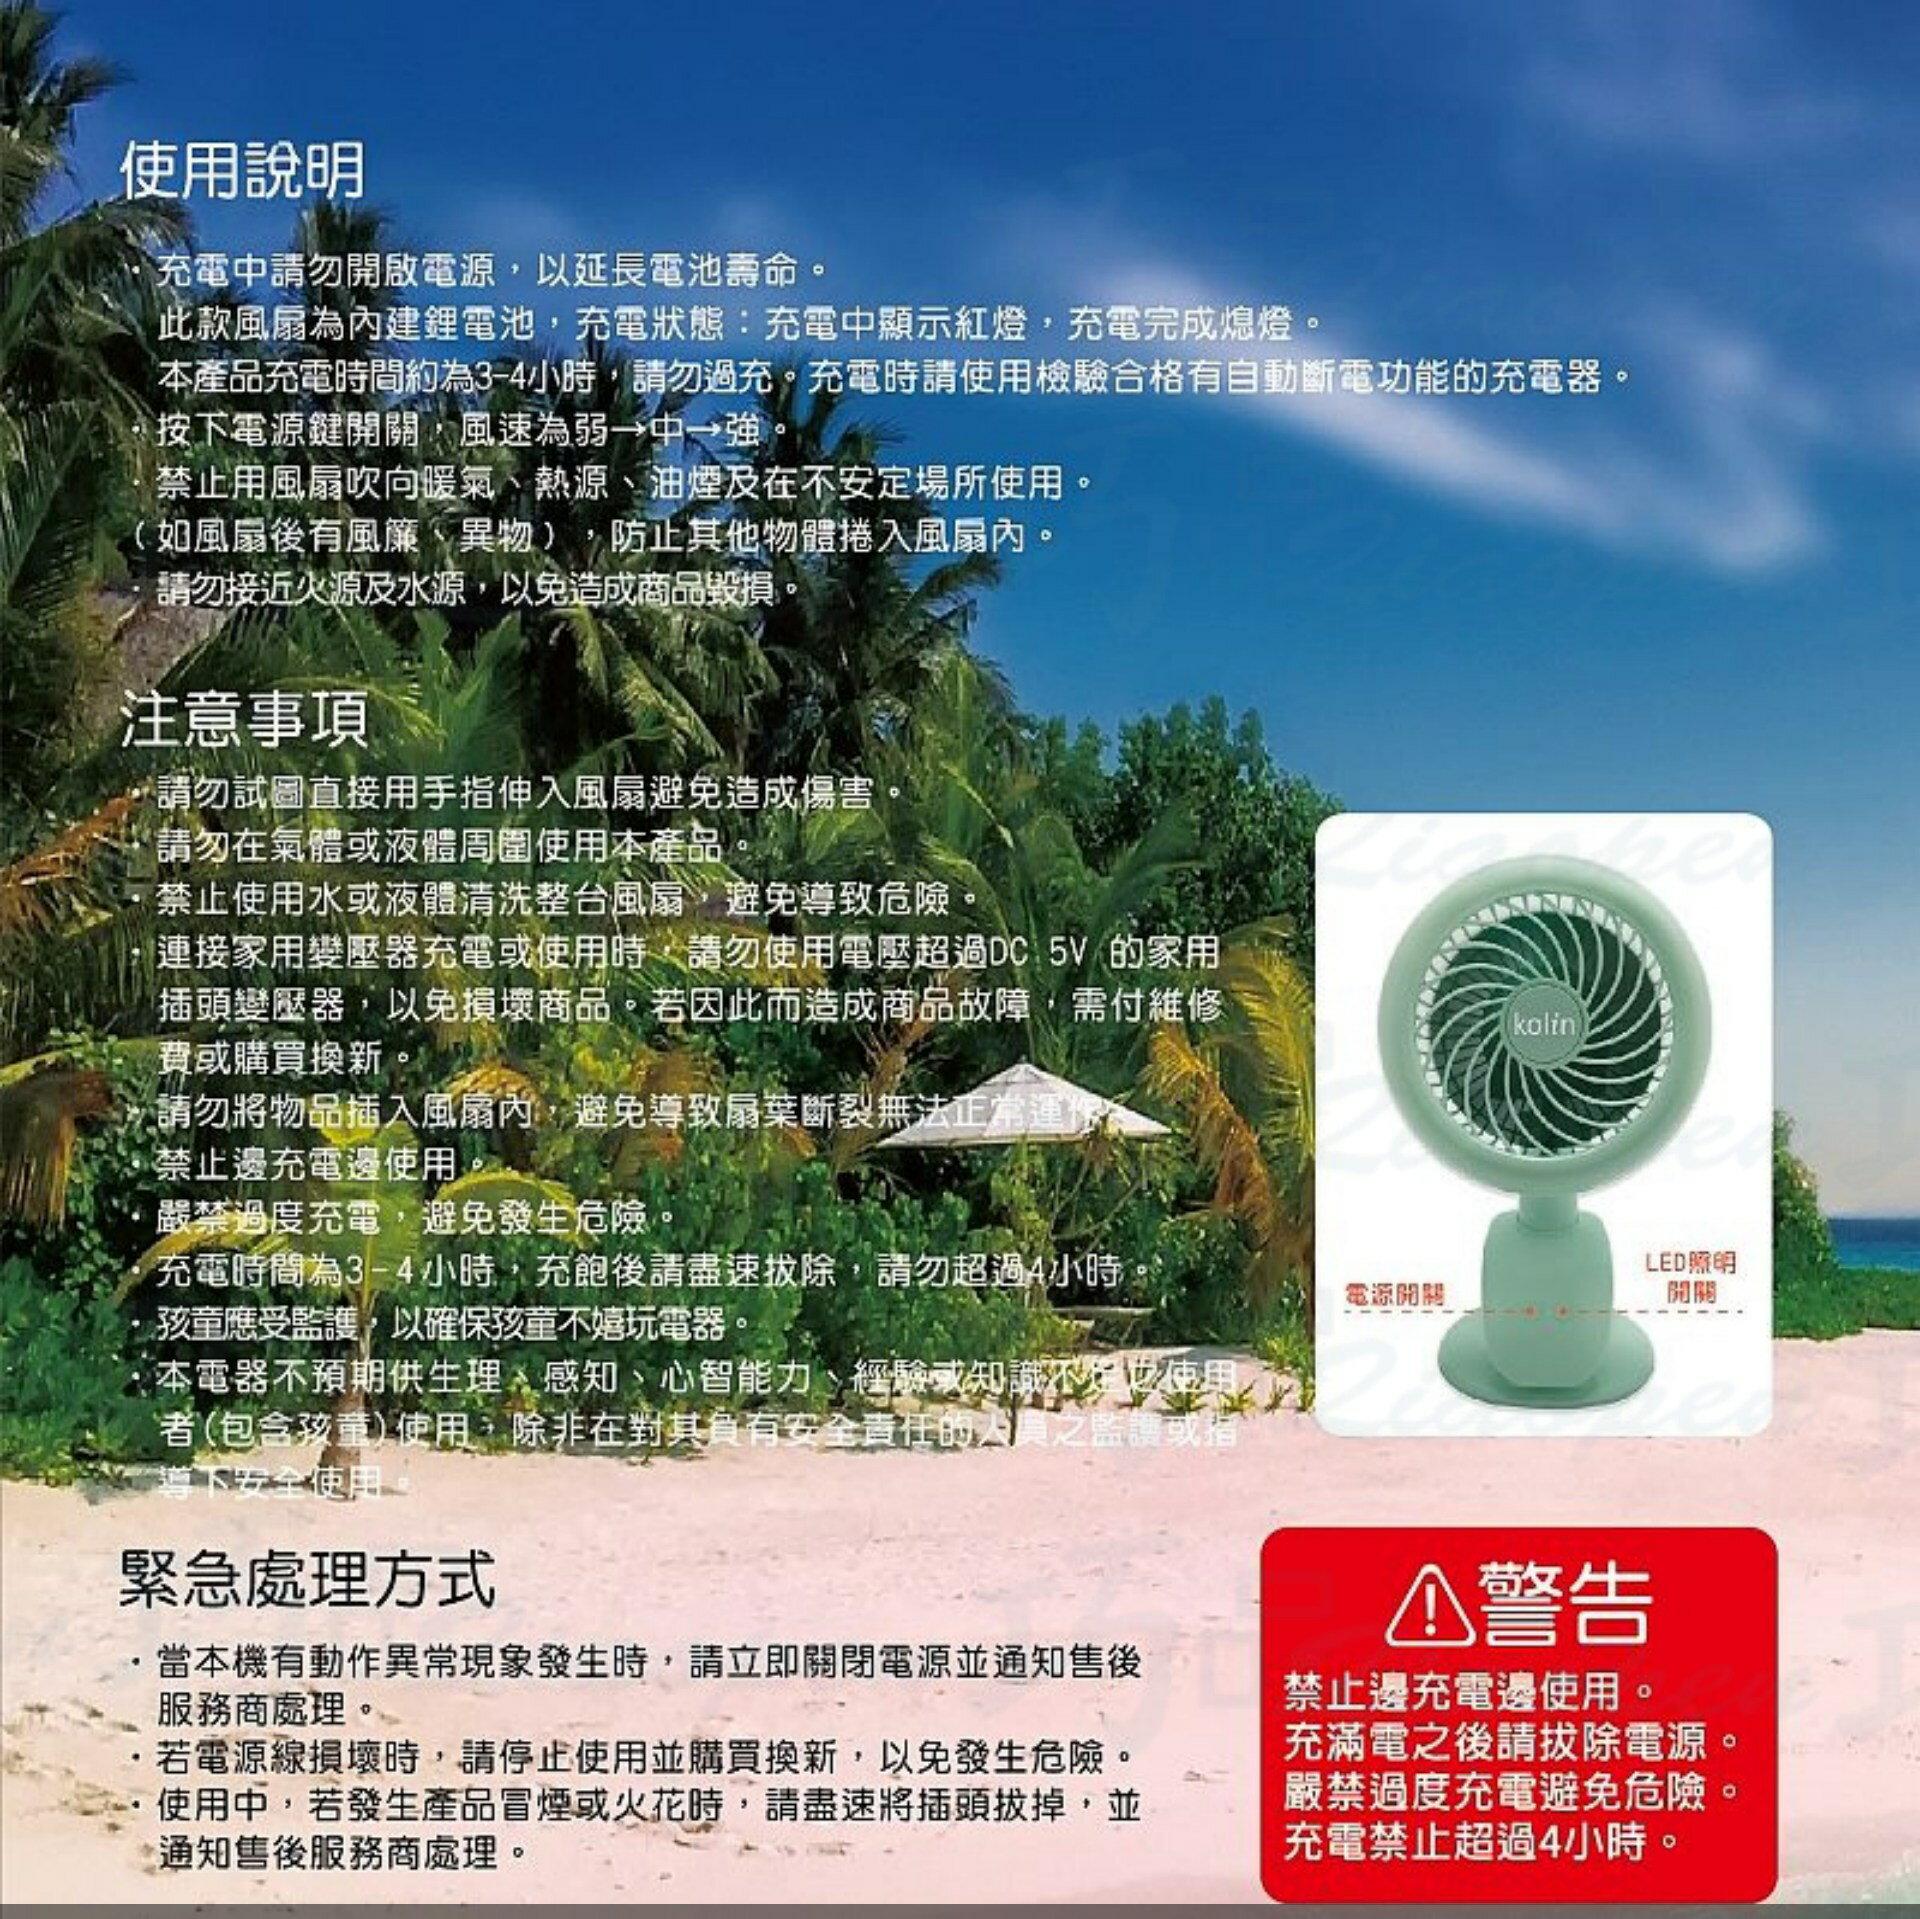 KEF-HCA01 kolin 歌林USB充電夾式風扇5吋 (顏色隨機出貨)一次買兩件更優惠★